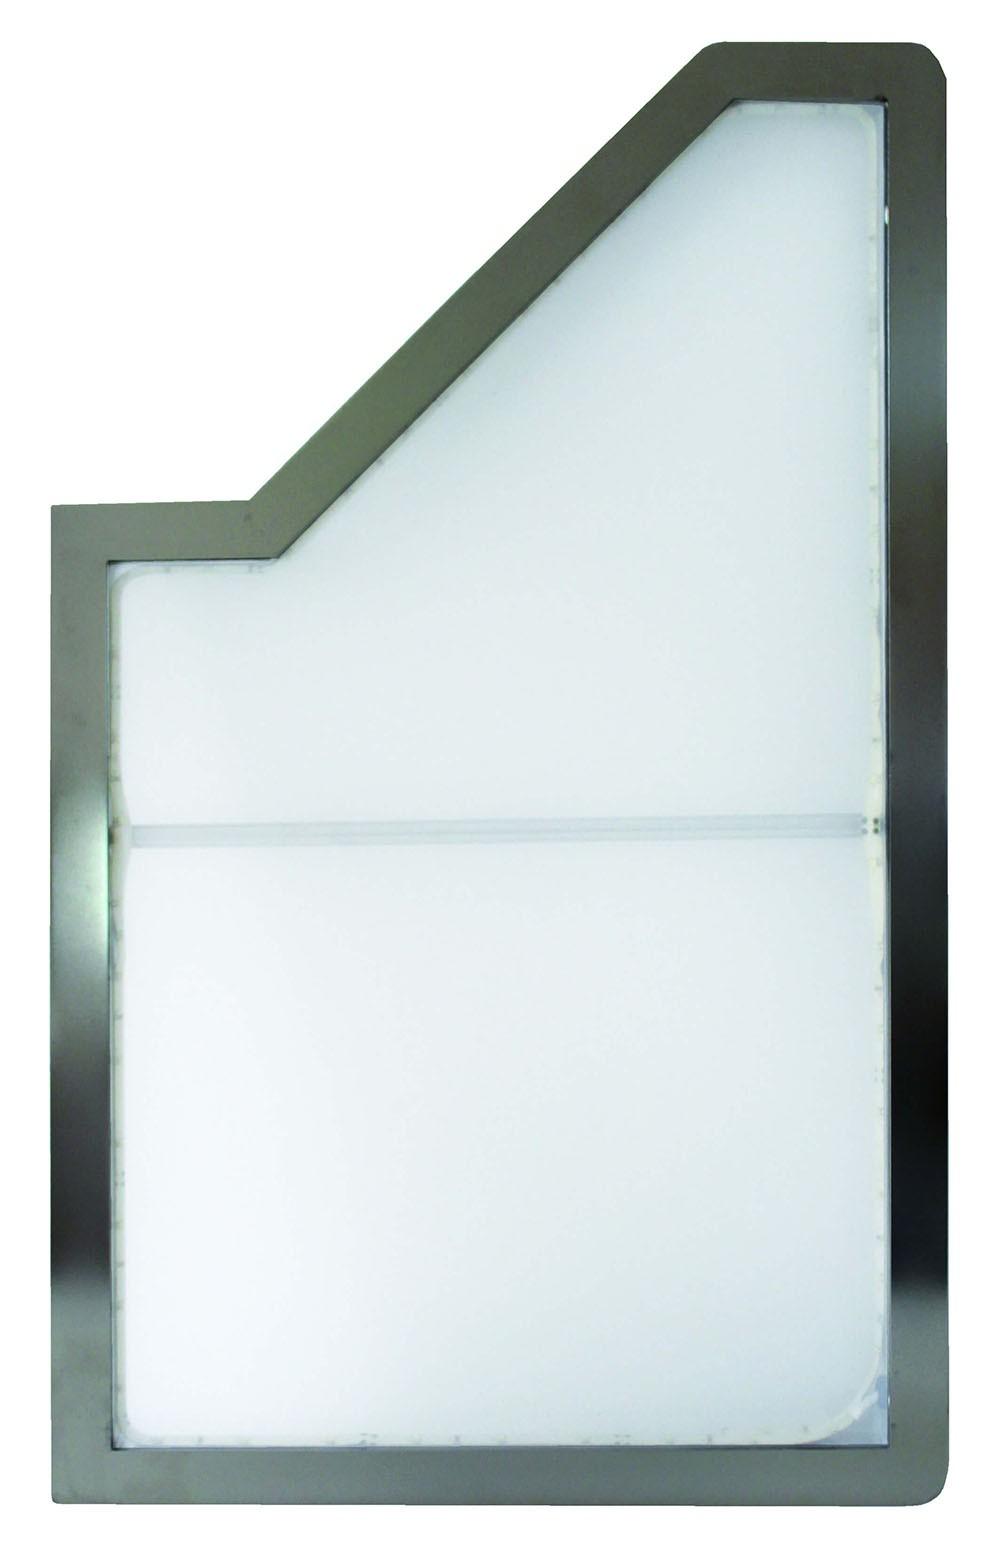 Reinraumtechnik – Laminarisatoren – CG-Verteiler (Sterilluftverteiler)